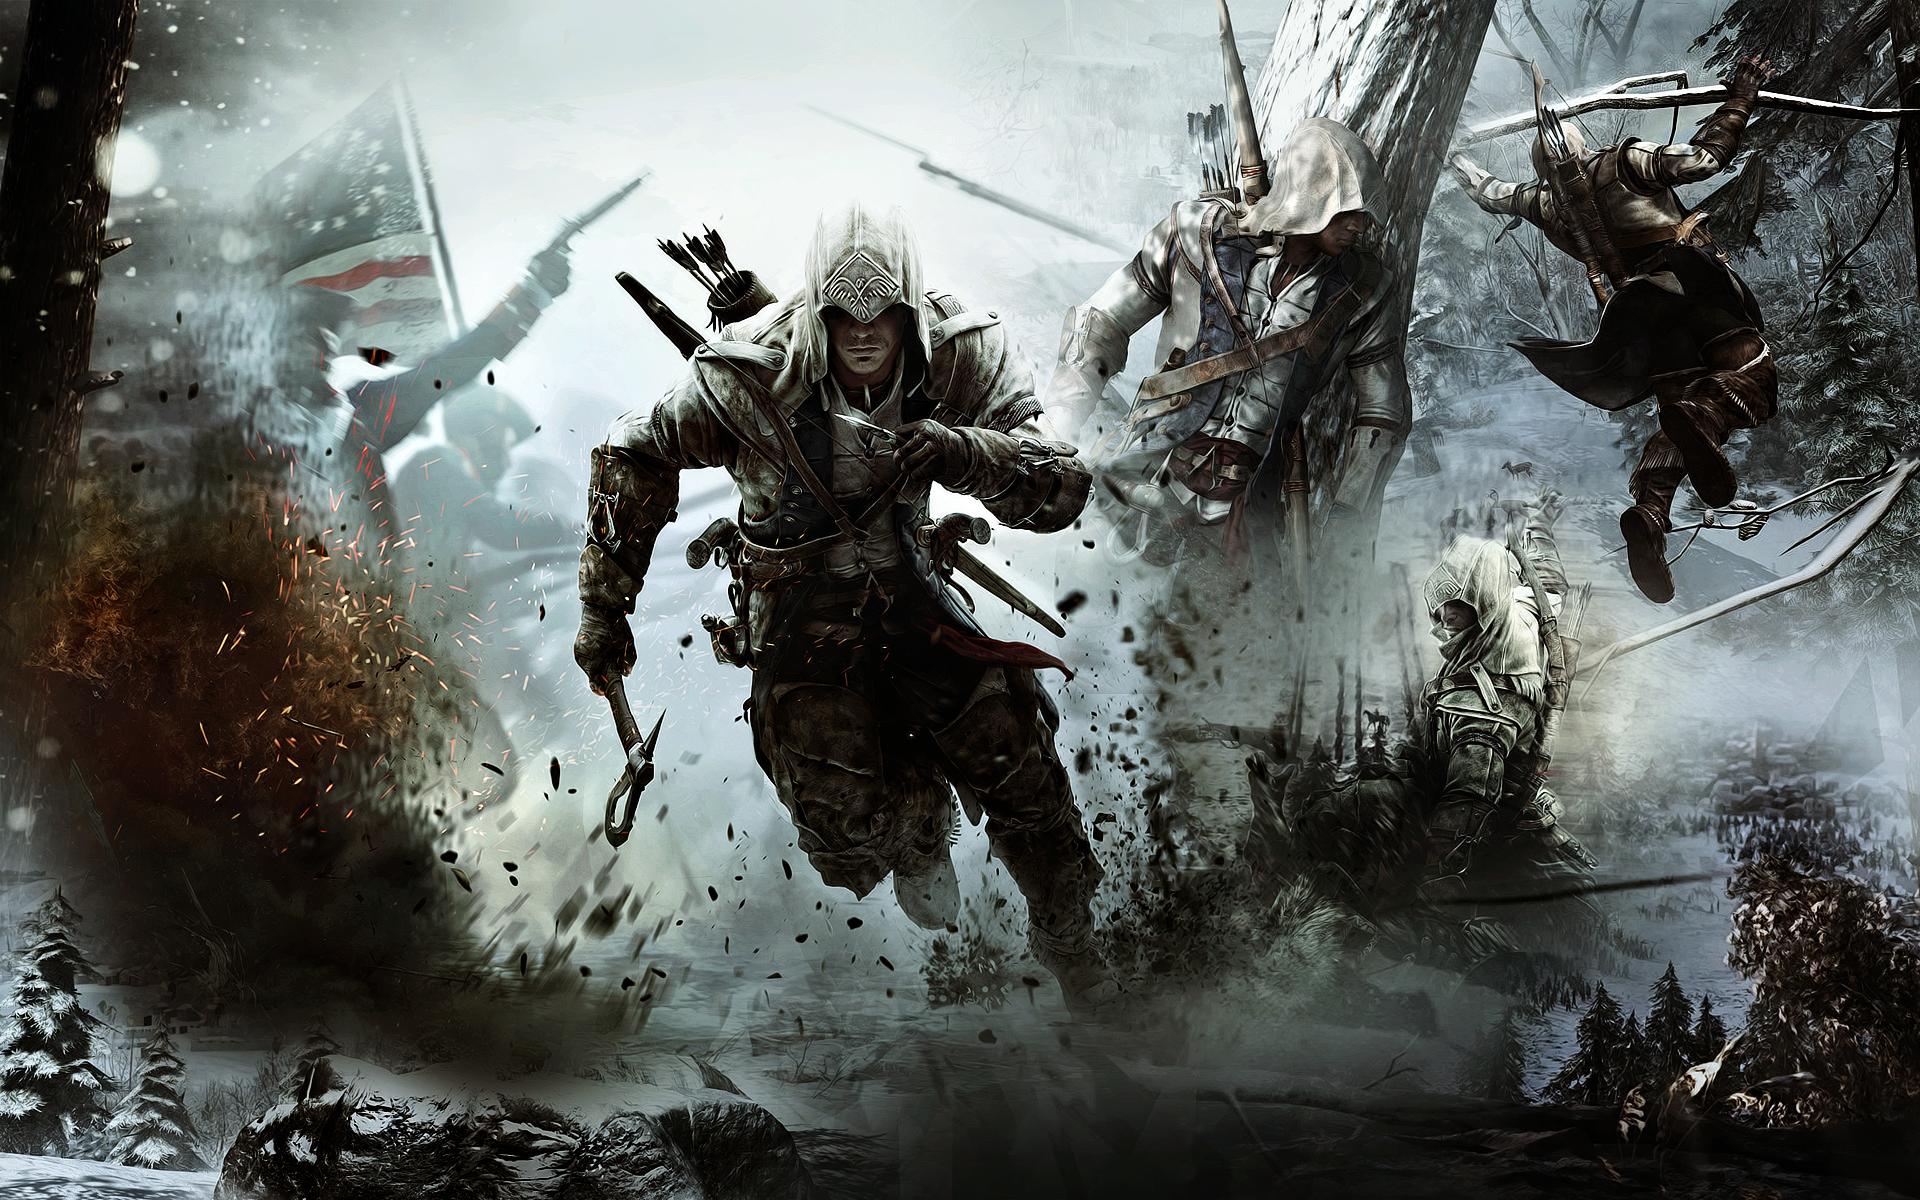 Free Download Assassins Creed Iii The Assassins Wallpaper 32391622